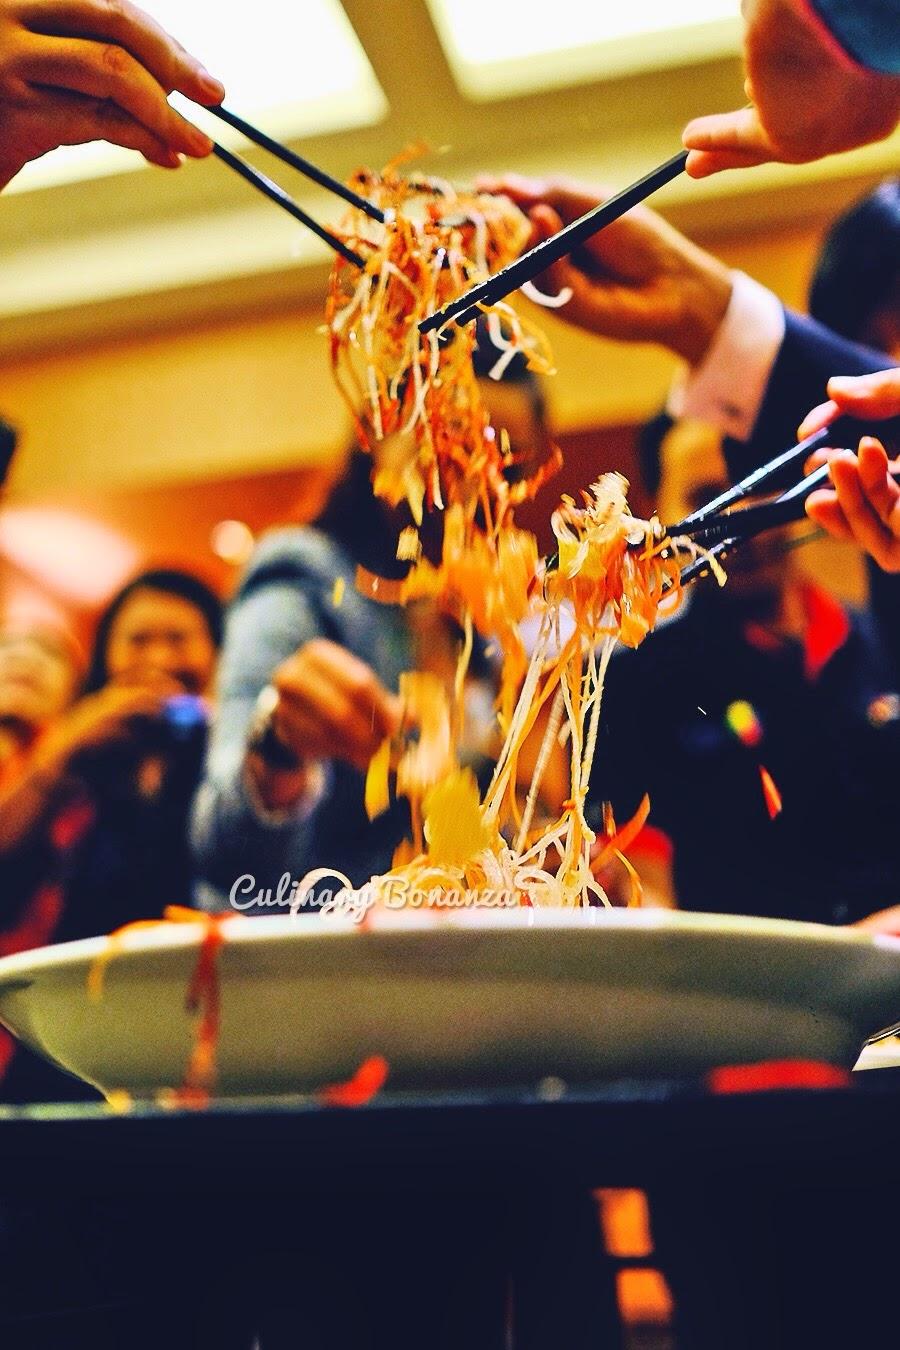 Tossing Yee Sang (www.culinarybonanza.com)